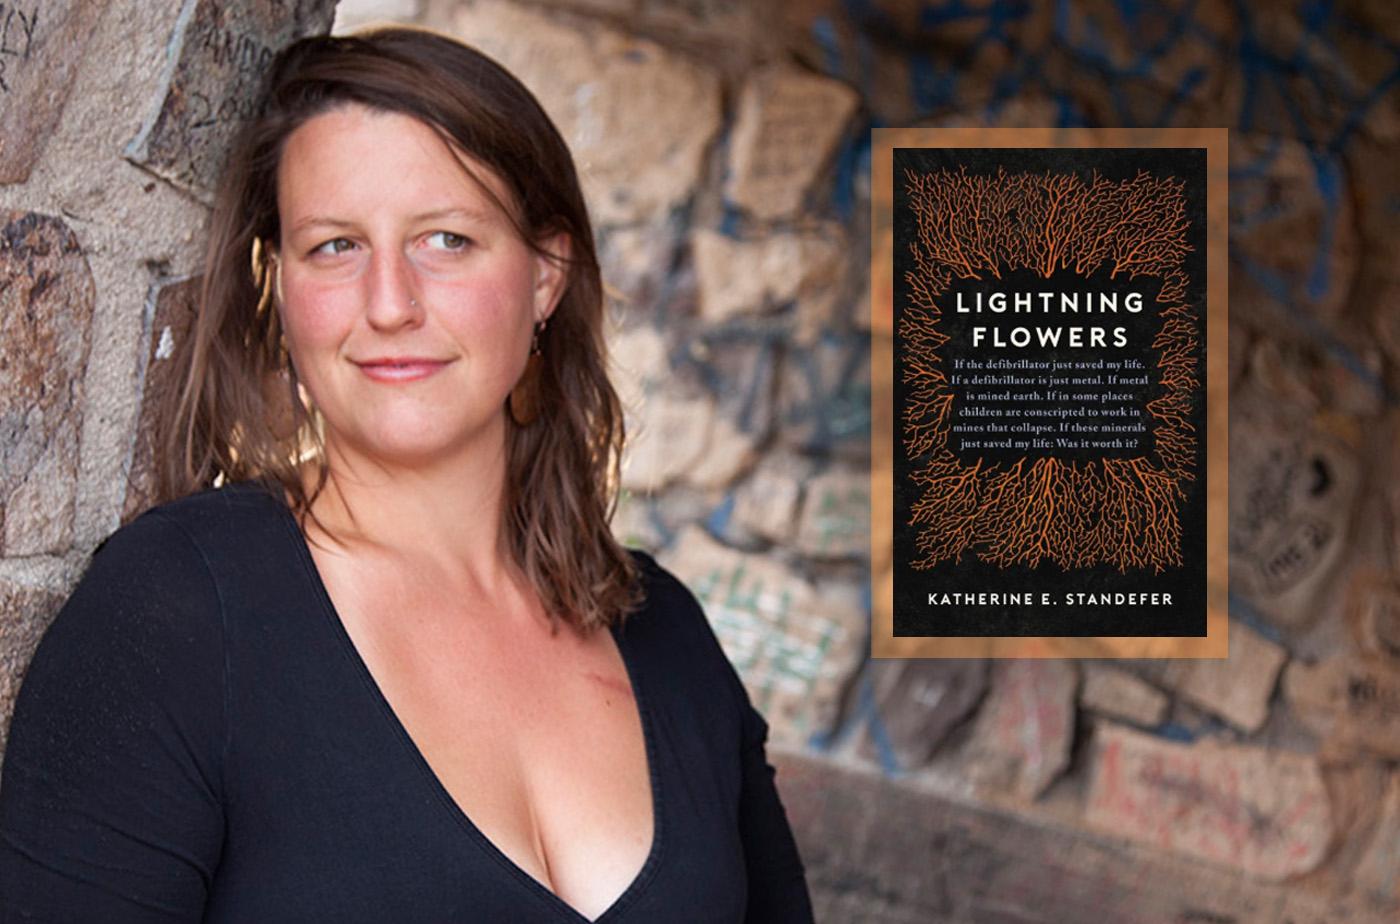 Catapult online classes: Katherine Standefer, 8-Week Online Nonfiction Workshop: Writing the Personal Sex Essay, Nonfiction, Workshop